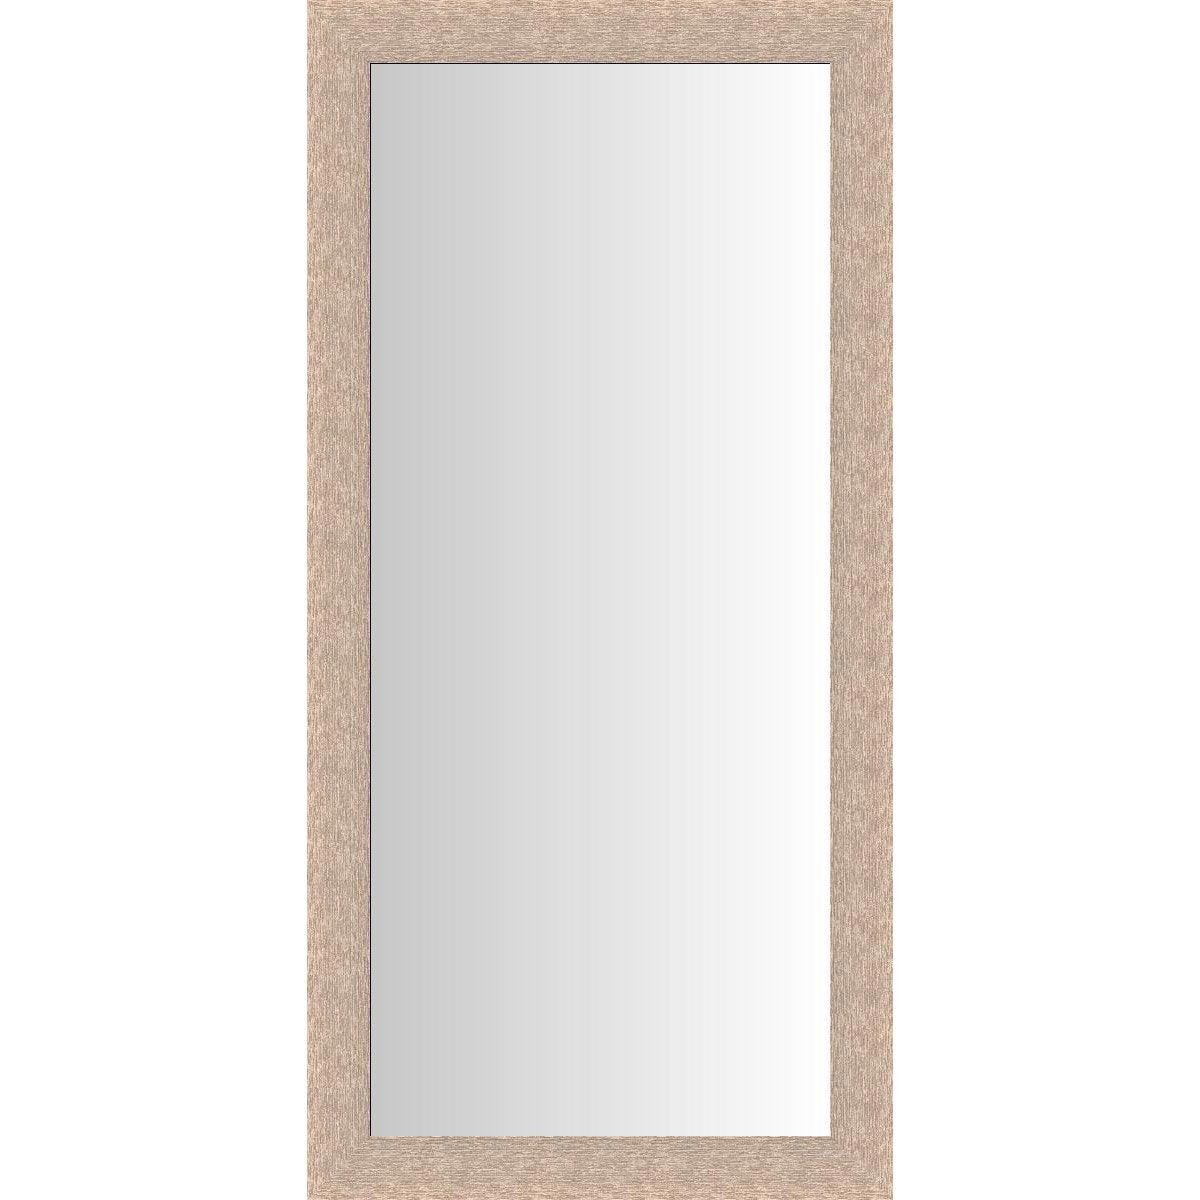 Miroir dublin ch ne clair blanchi 60x140 cm leroy merlin for Miroir 140x60